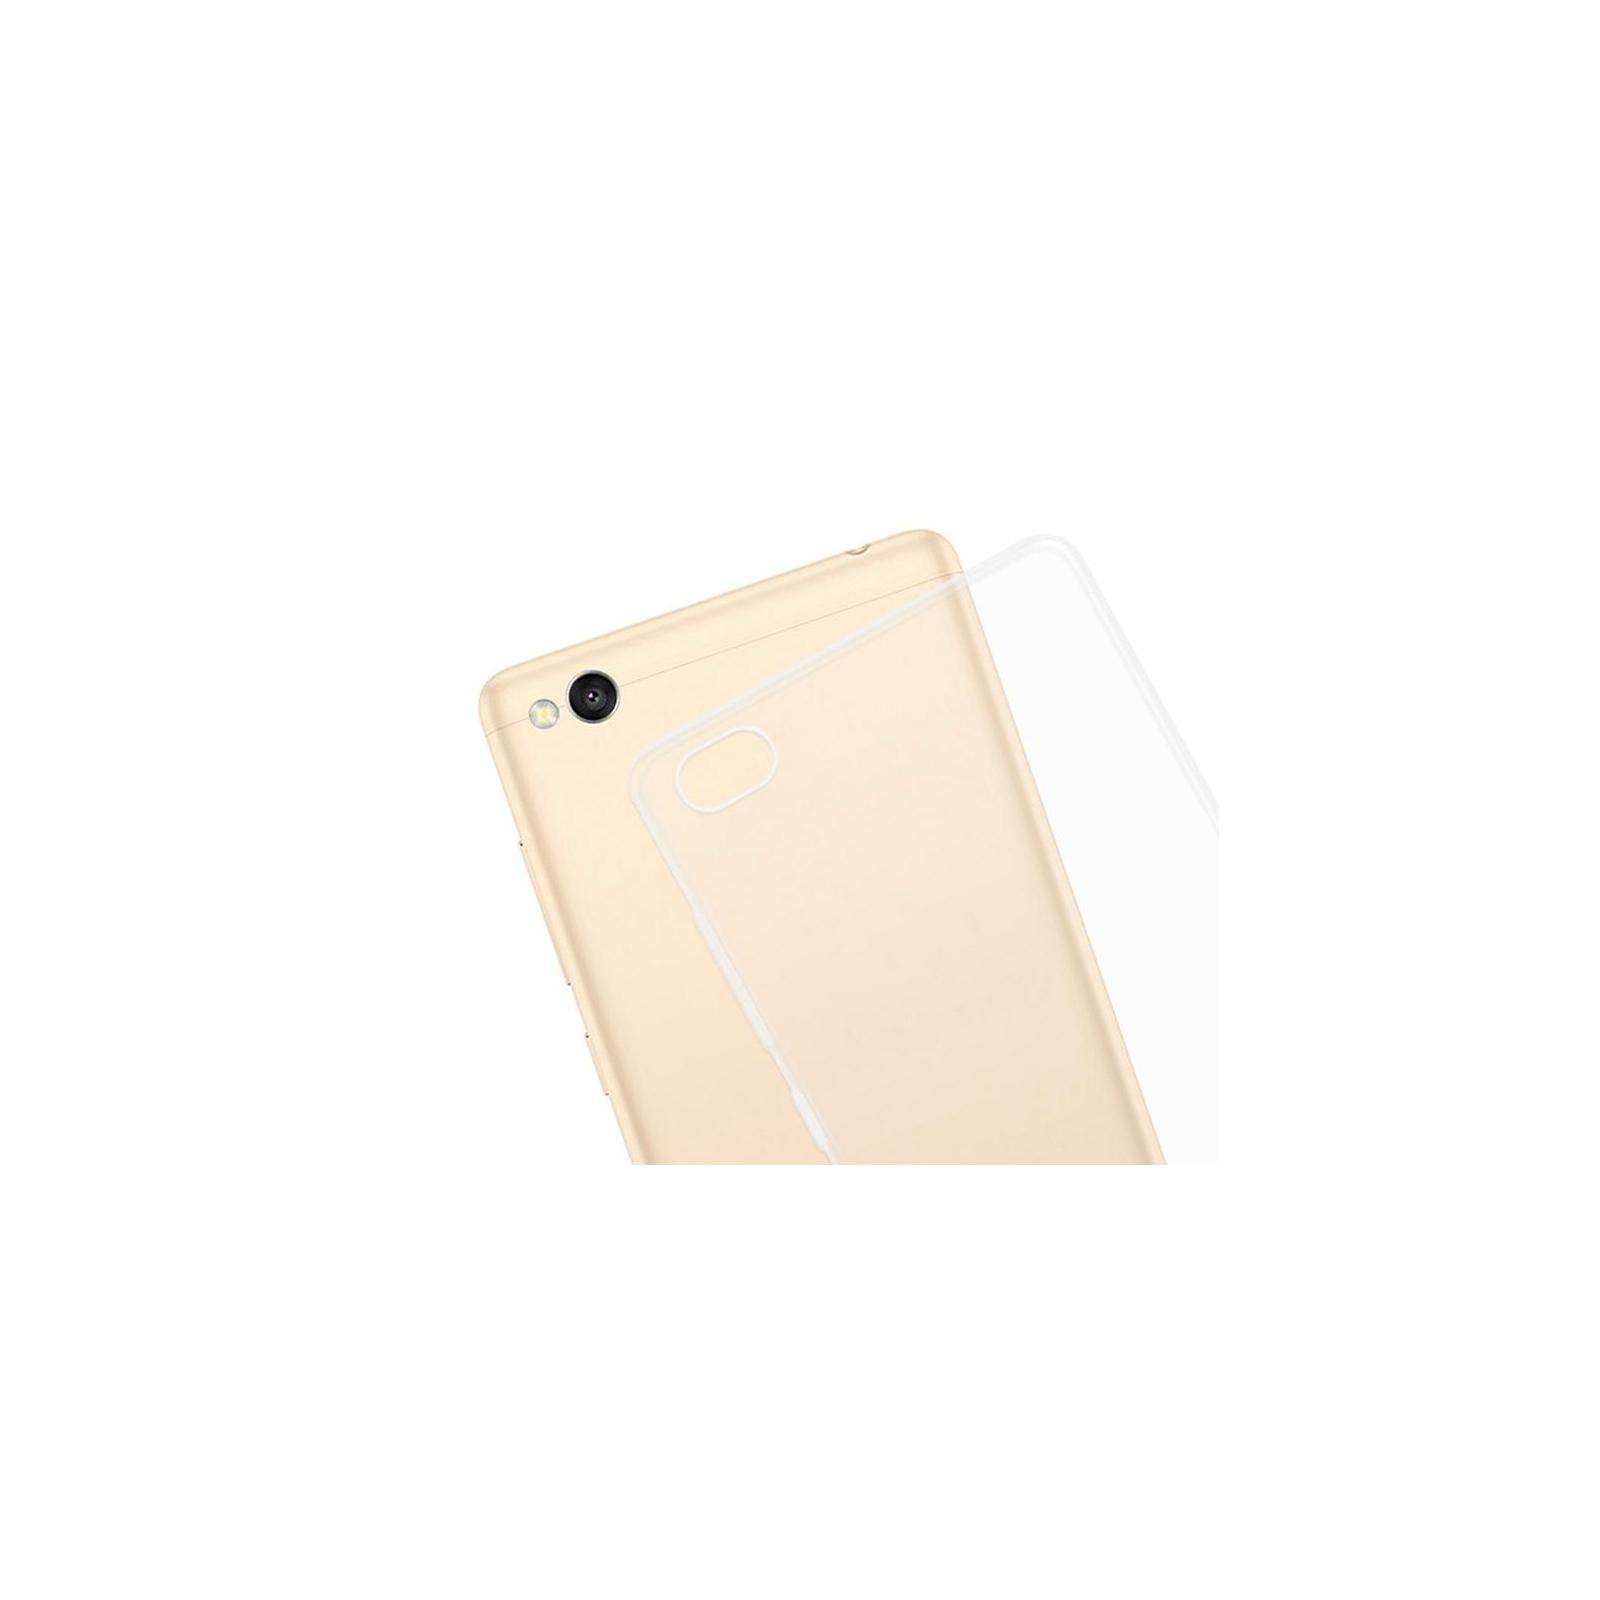 Чехол для моб. телефона SmartCase Xiaomi Redmi 4A TPU Clear (SC-RMI4A) изображение 2